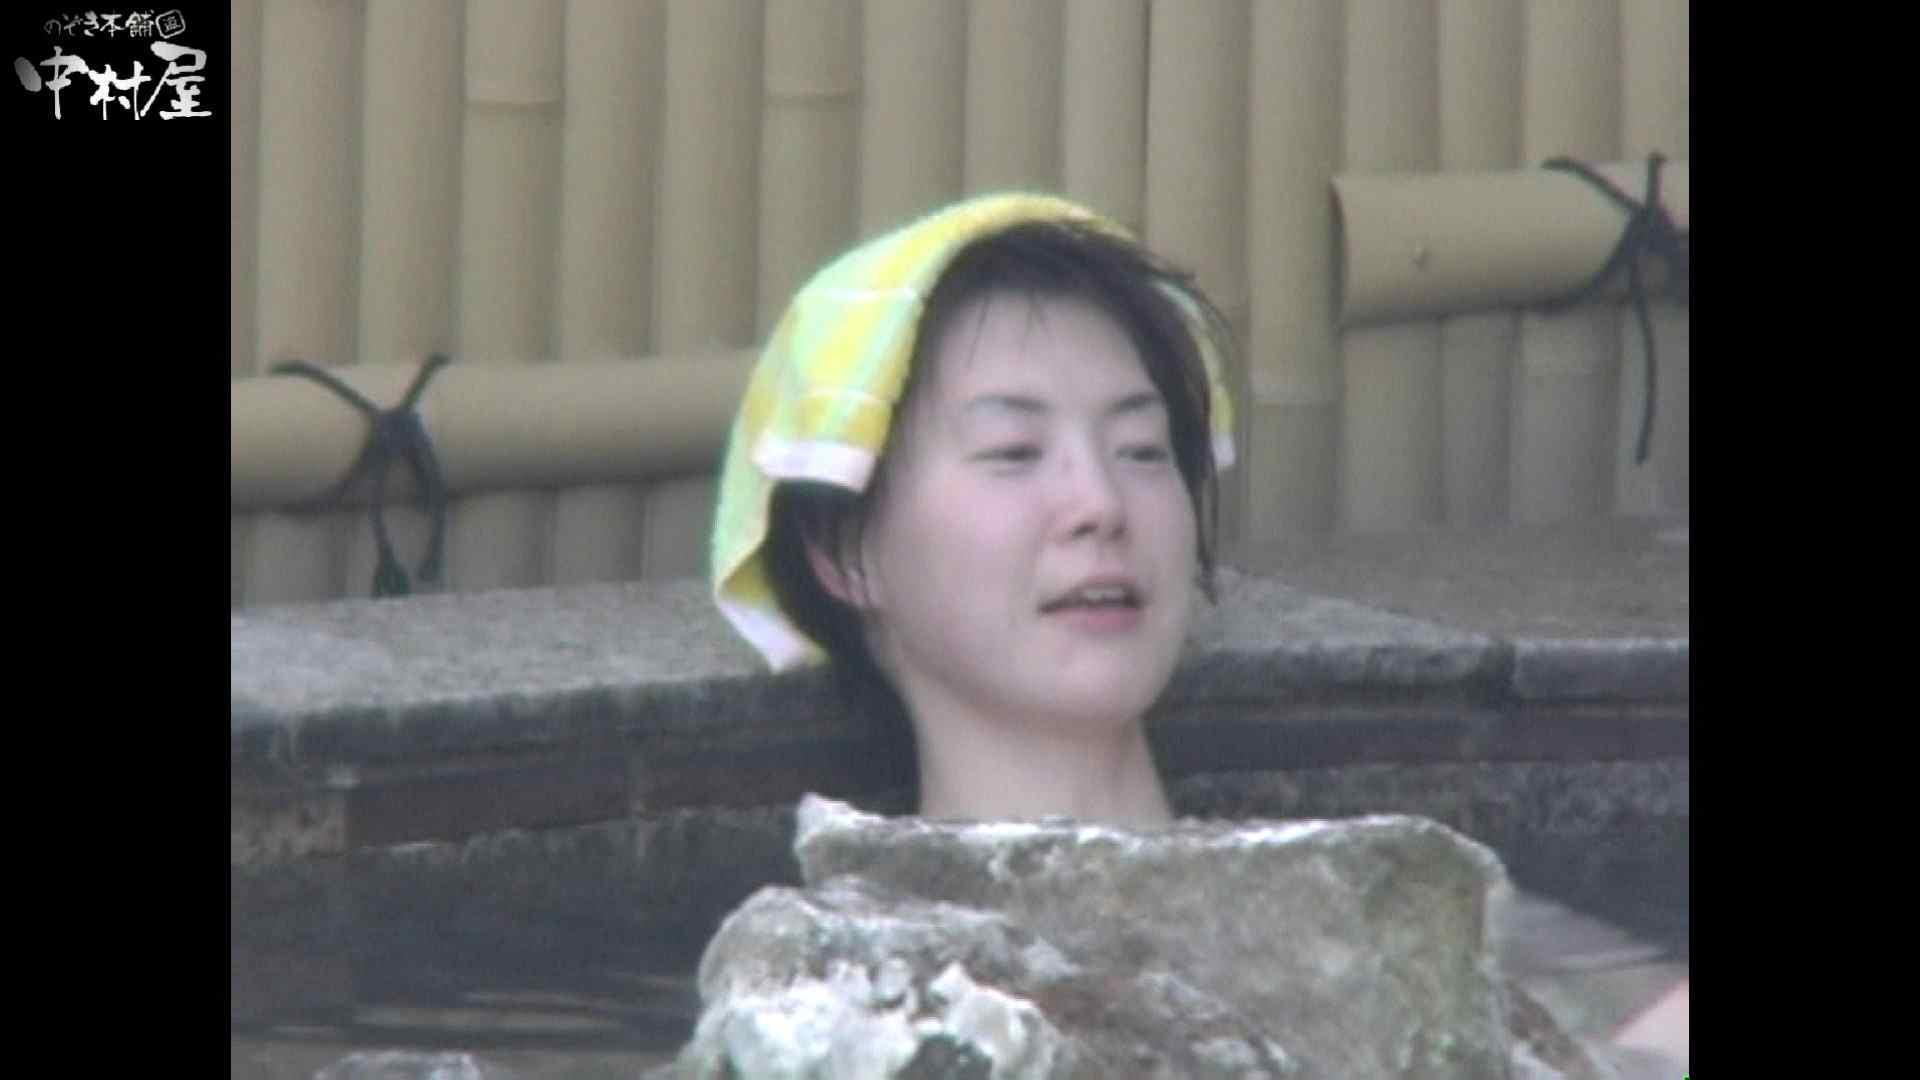 Aquaな露天風呂Vol.938 露天覗き オマンコ無修正動画無料 58枚